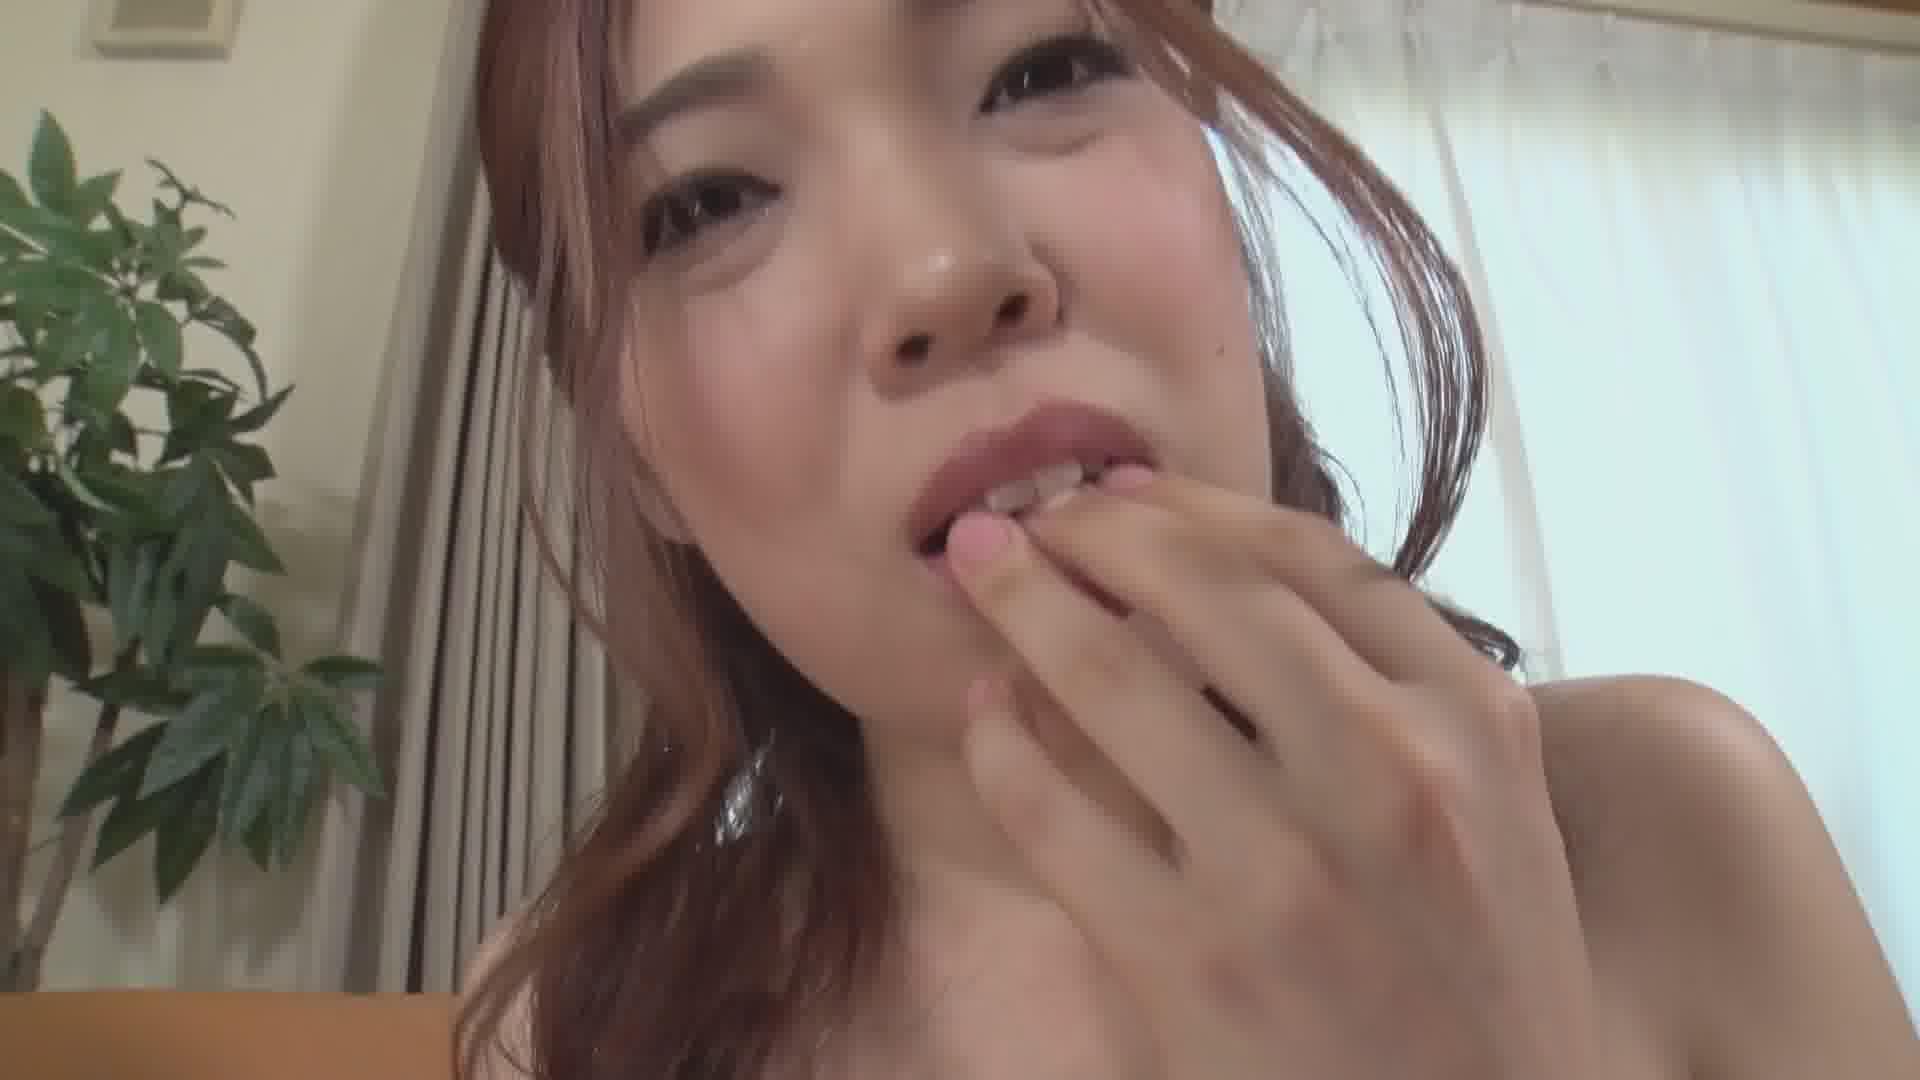 THE 未公開 ~敏感マゾ乳のすごいパイズリ4~ - 朝比奈菜々子【パイズリ・ぶっかけ・口内発射】